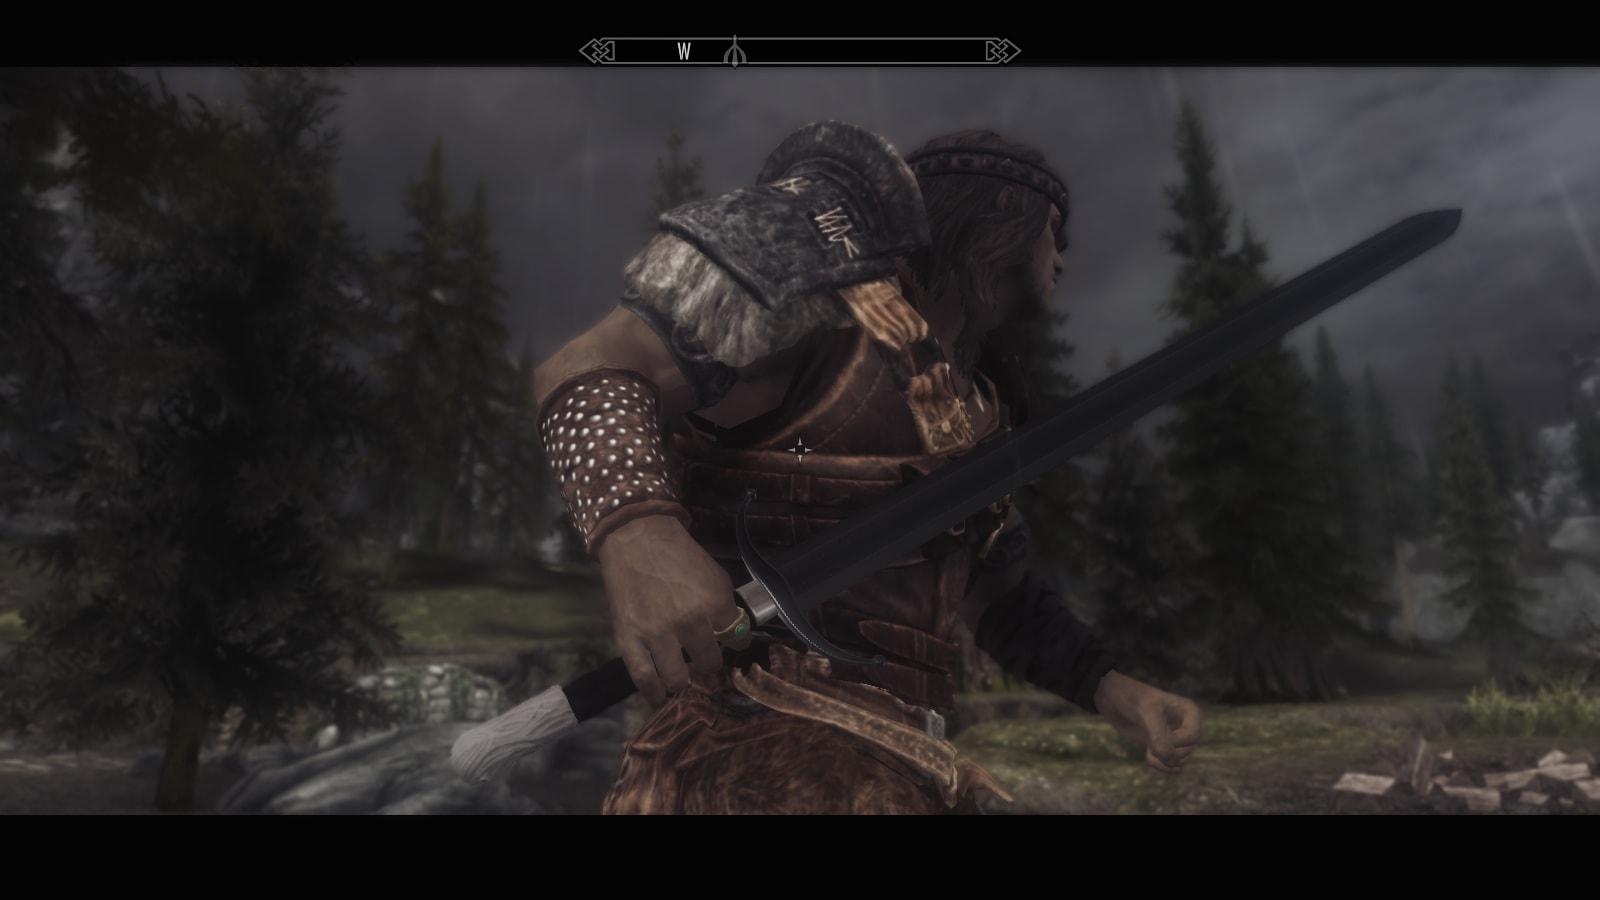 русификатор horse armor pack - Prakard